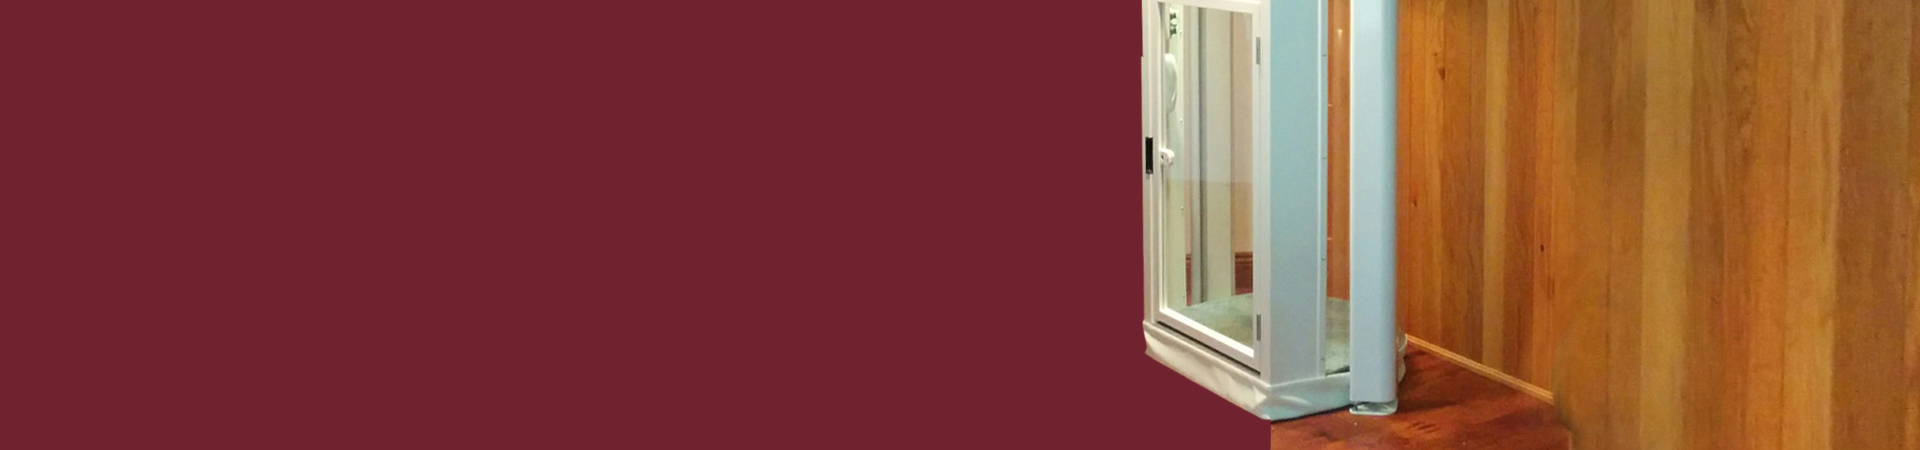 Home elevators illinois stair lifts platform elevators for Home elevators direct